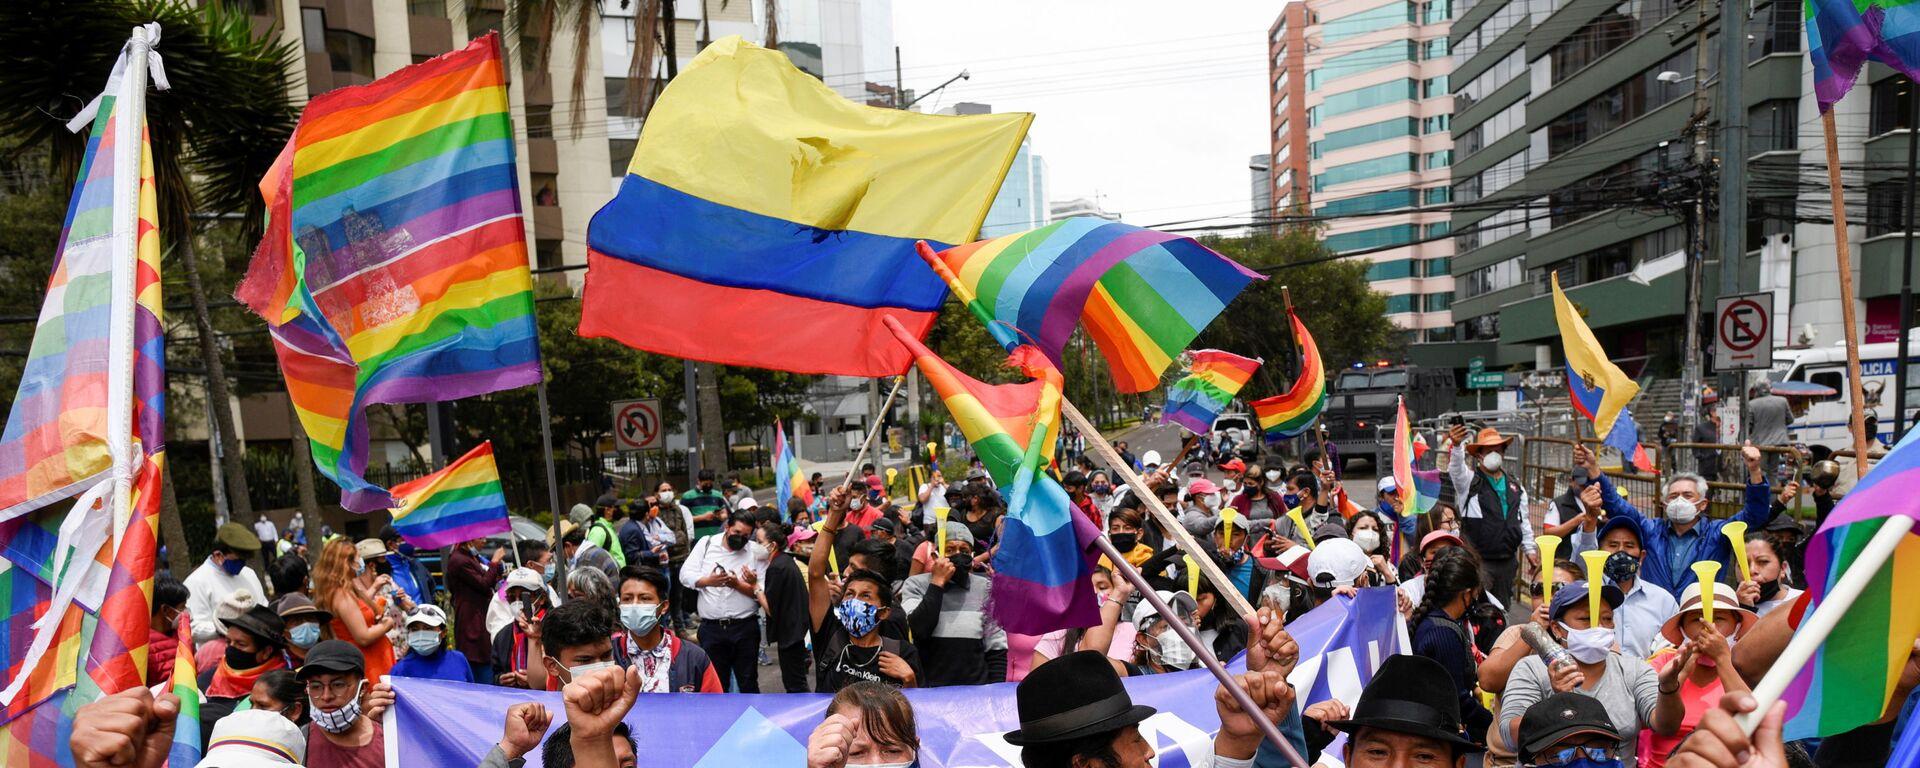 Simpatizantes del candidato a la presidencia ecuatoriana Yaku Pérez - Sputnik Mundo, 1920, 09.02.2021